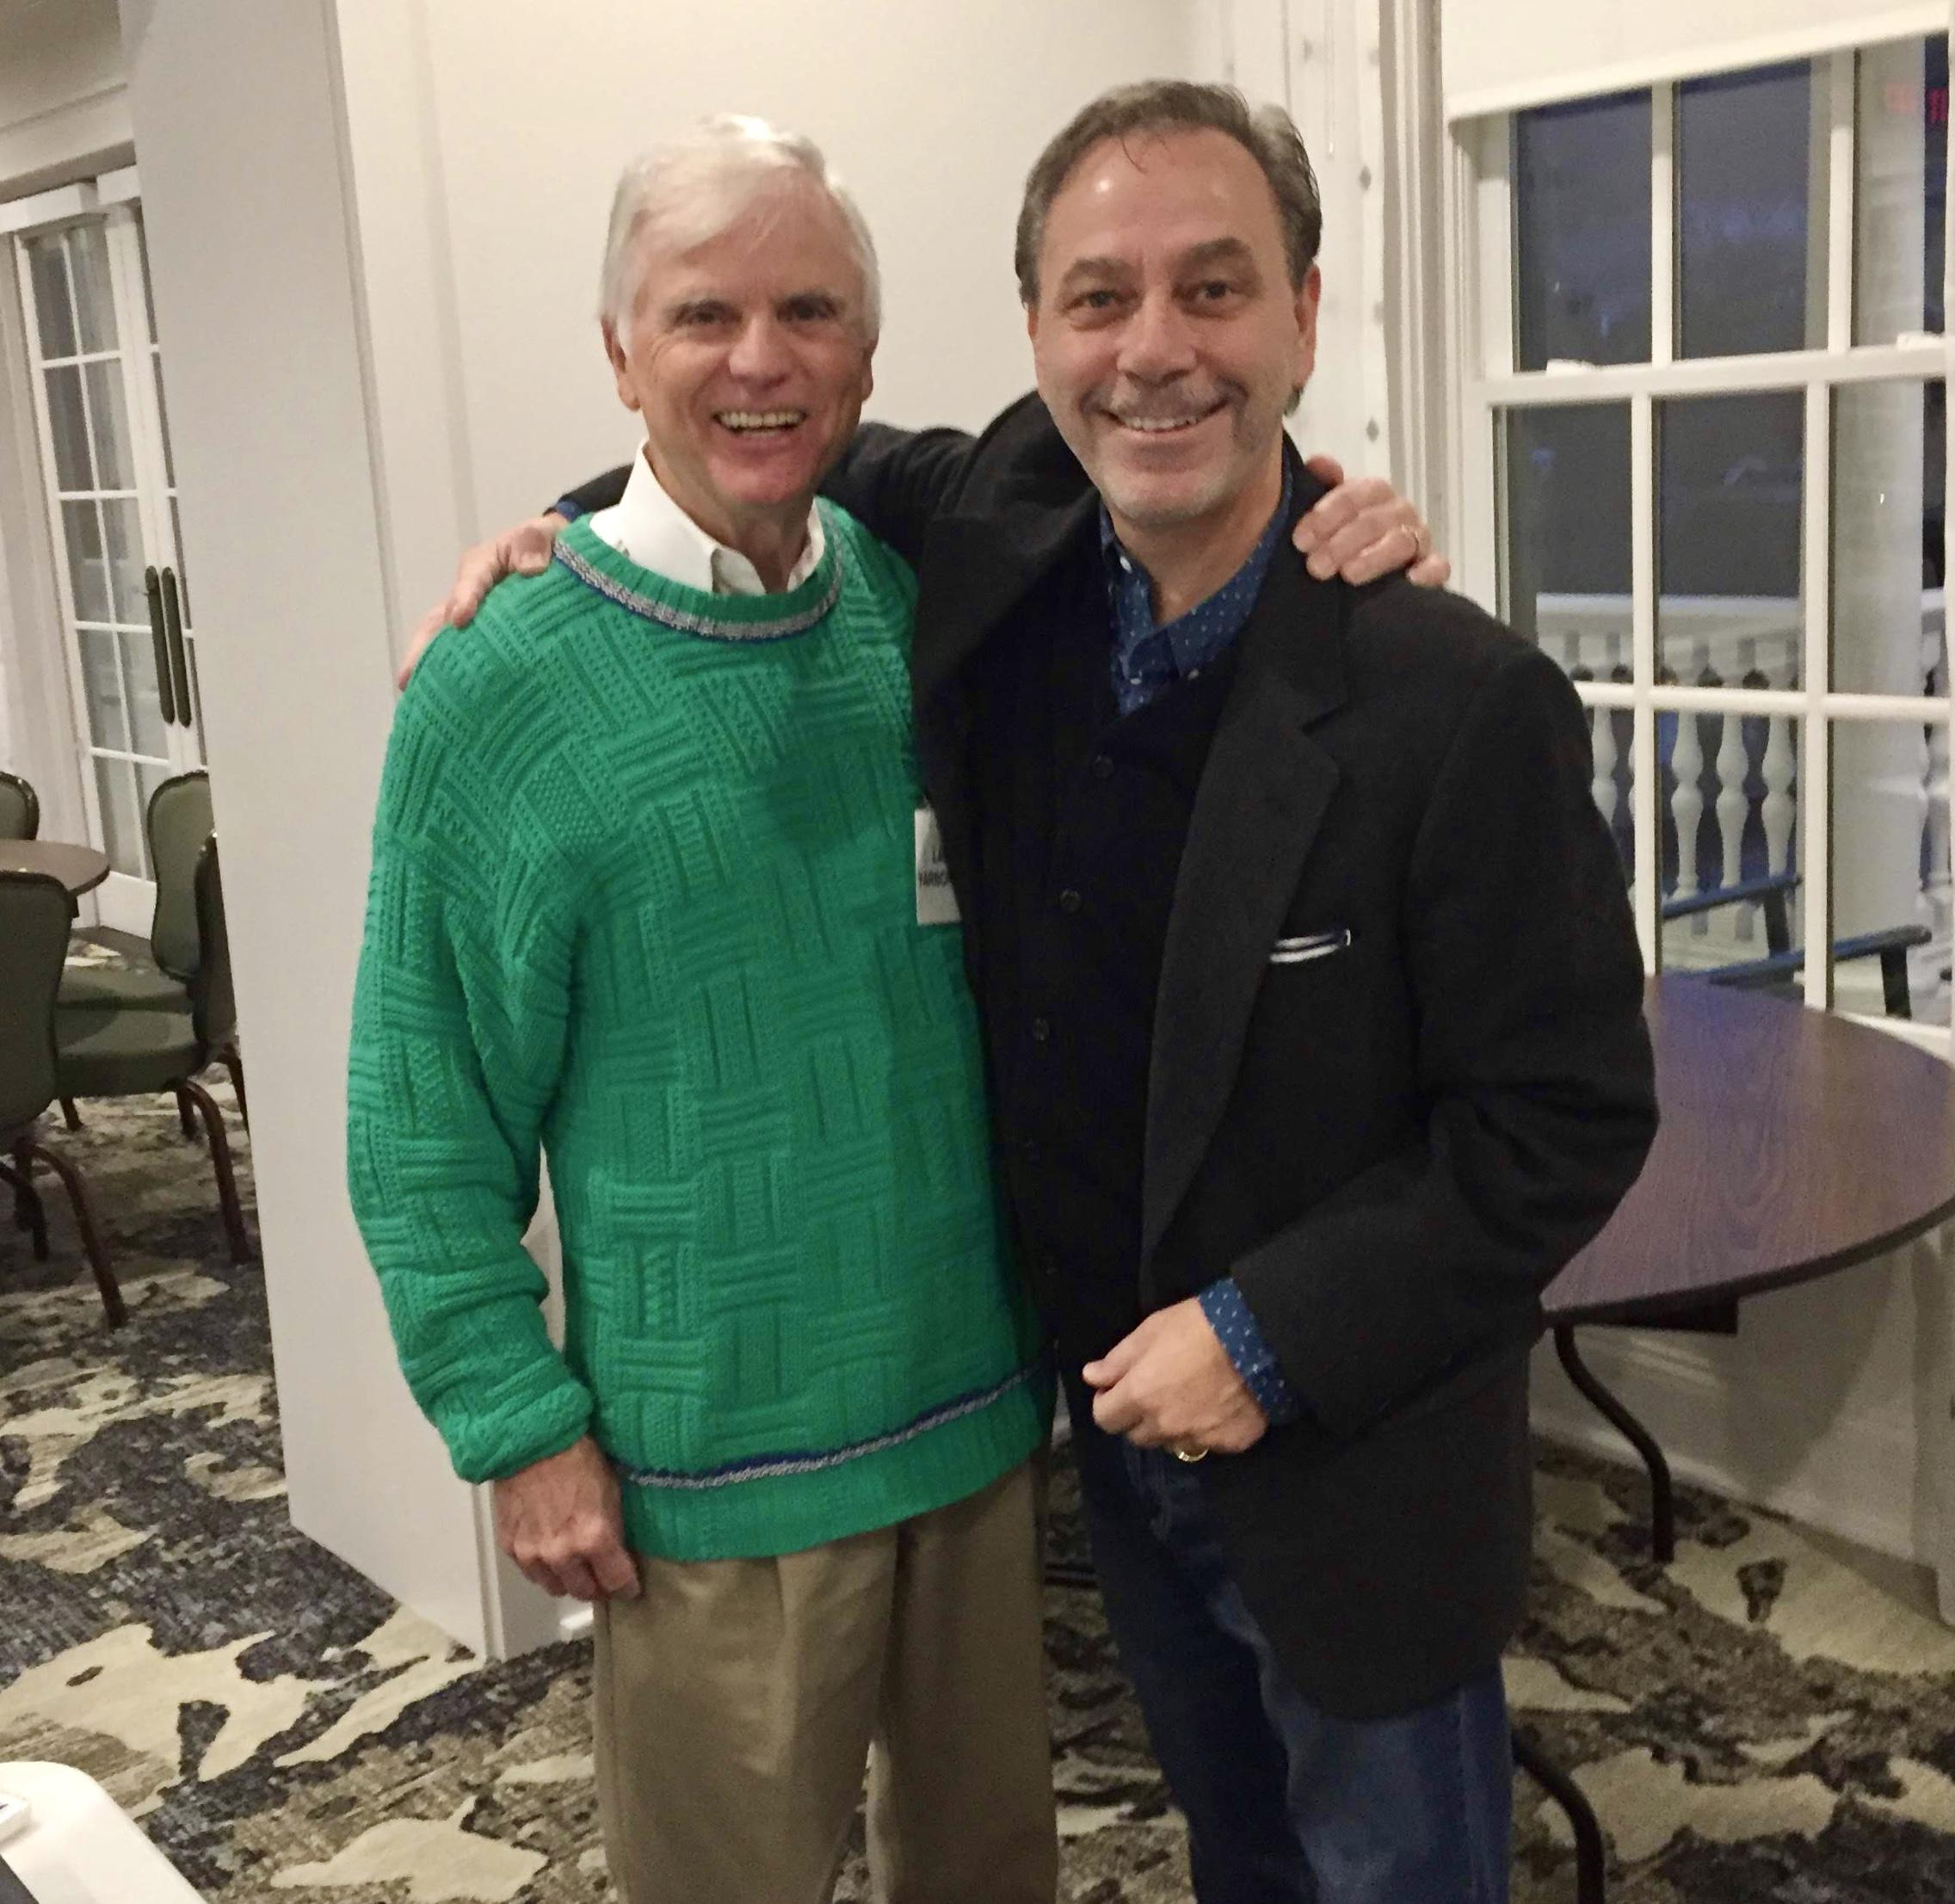 My friend Larry Yarbrough, esteemed Chaplain YMCA